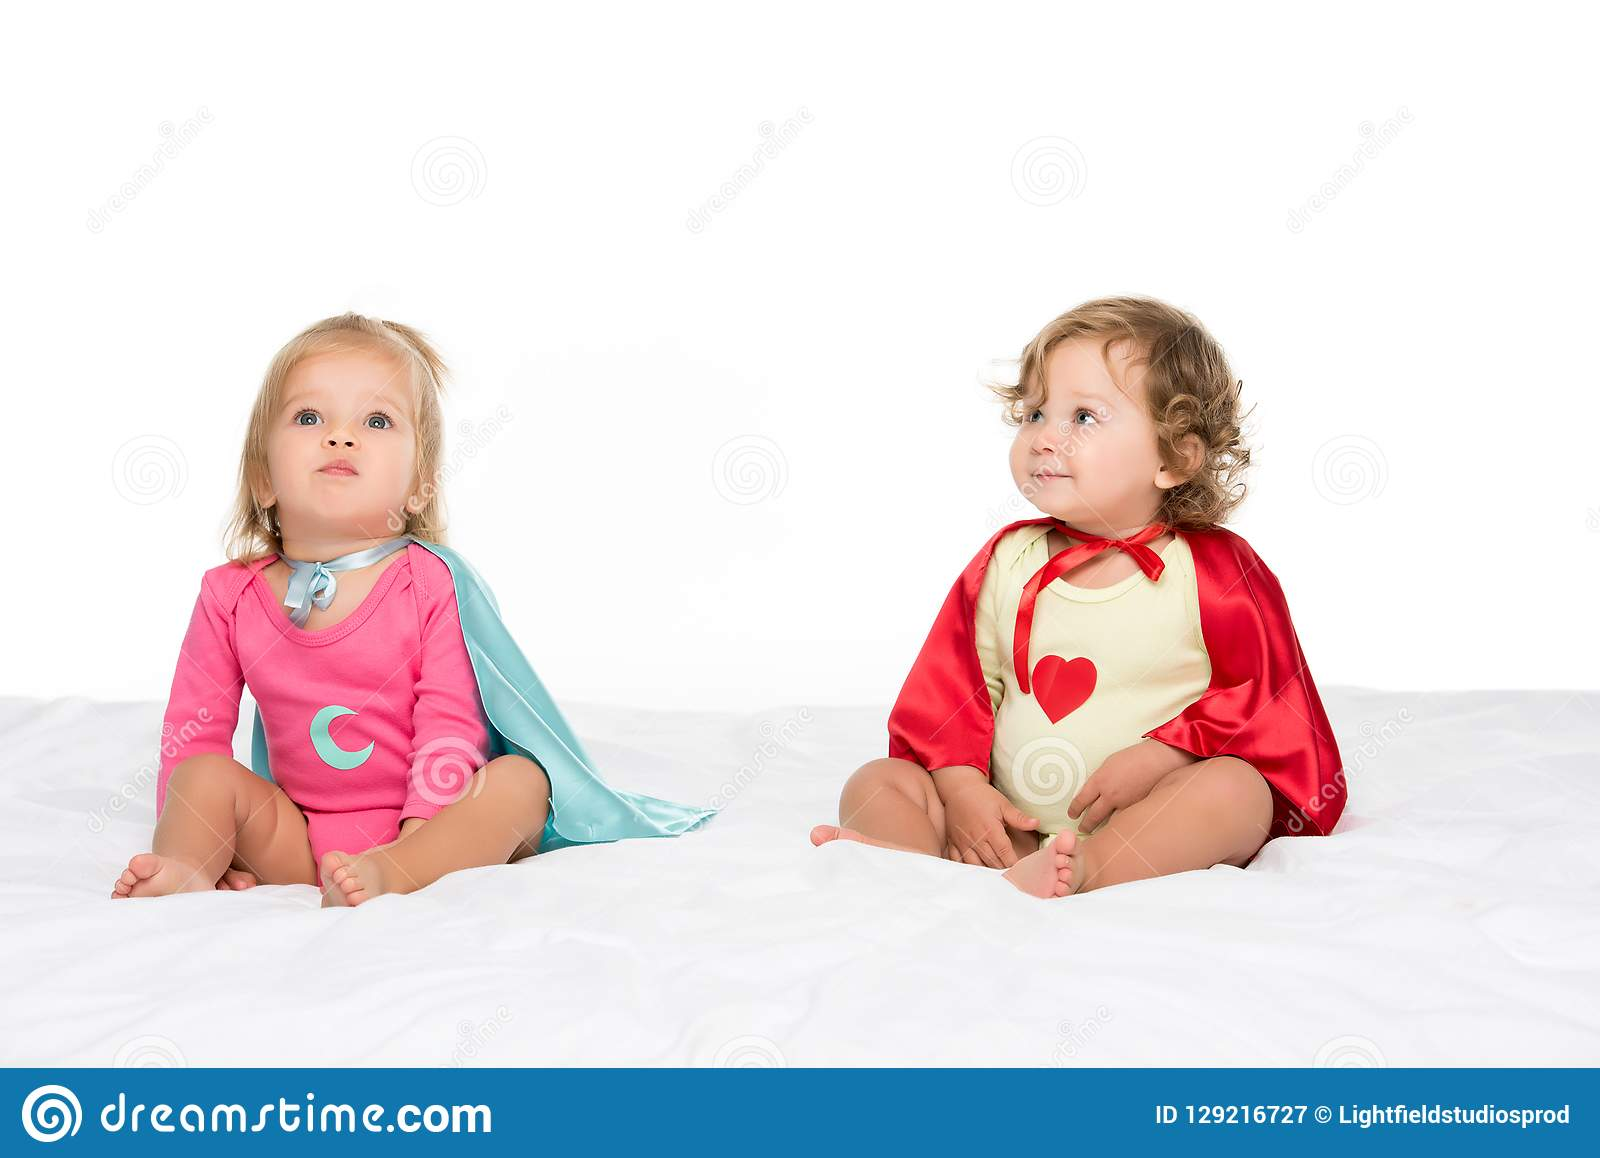 toddler girls in superhero capes